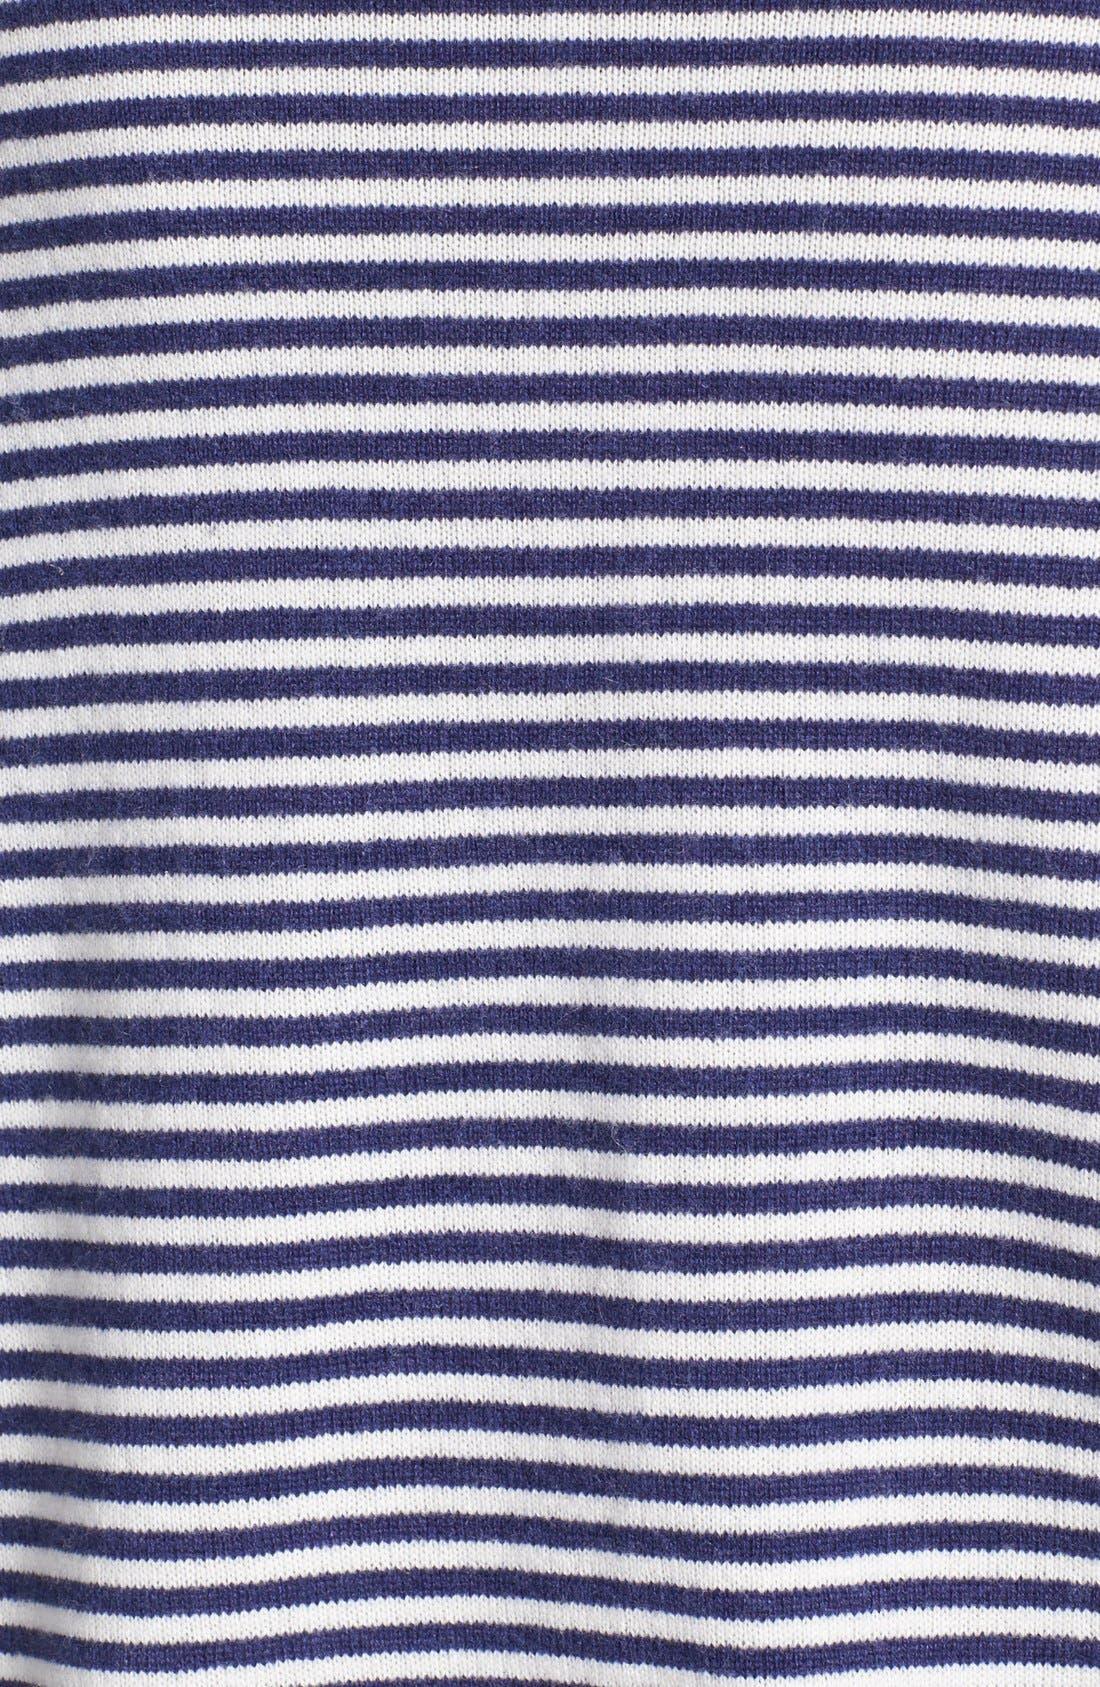 Alternate Image 3  - Joie 'Tiana' Wool & Cashmere Sweater